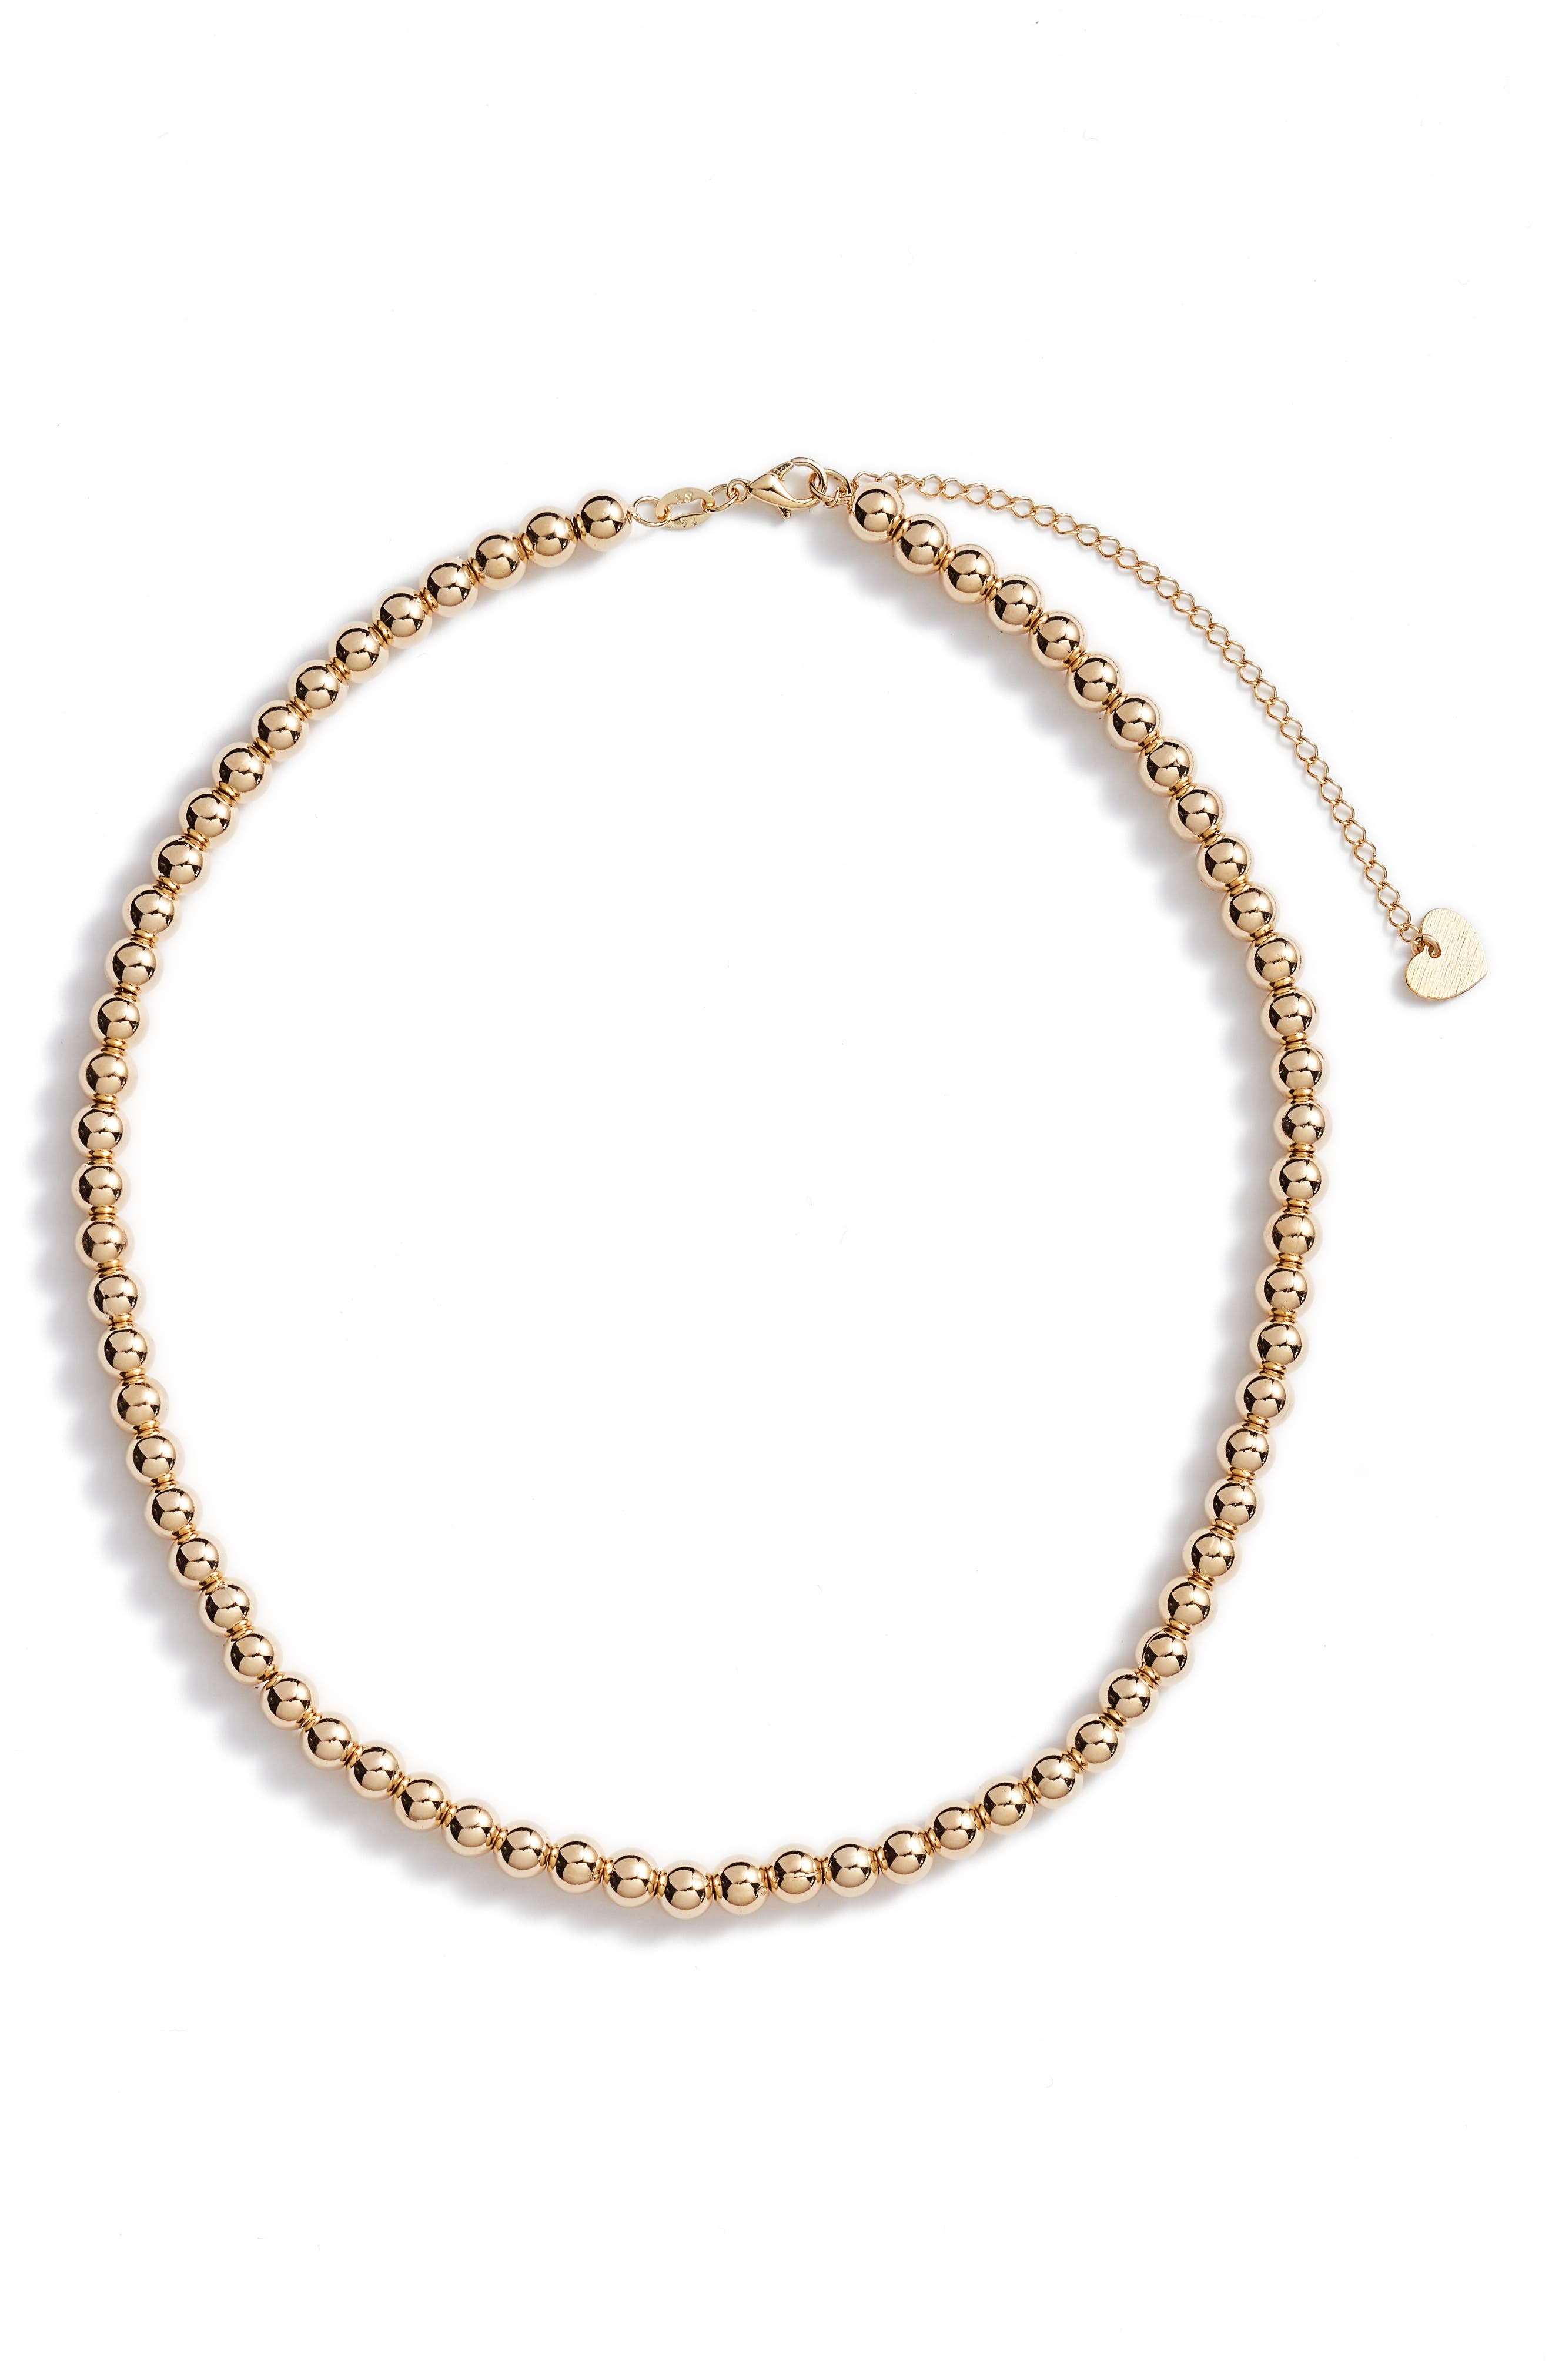 Olivia Beaded Necklace